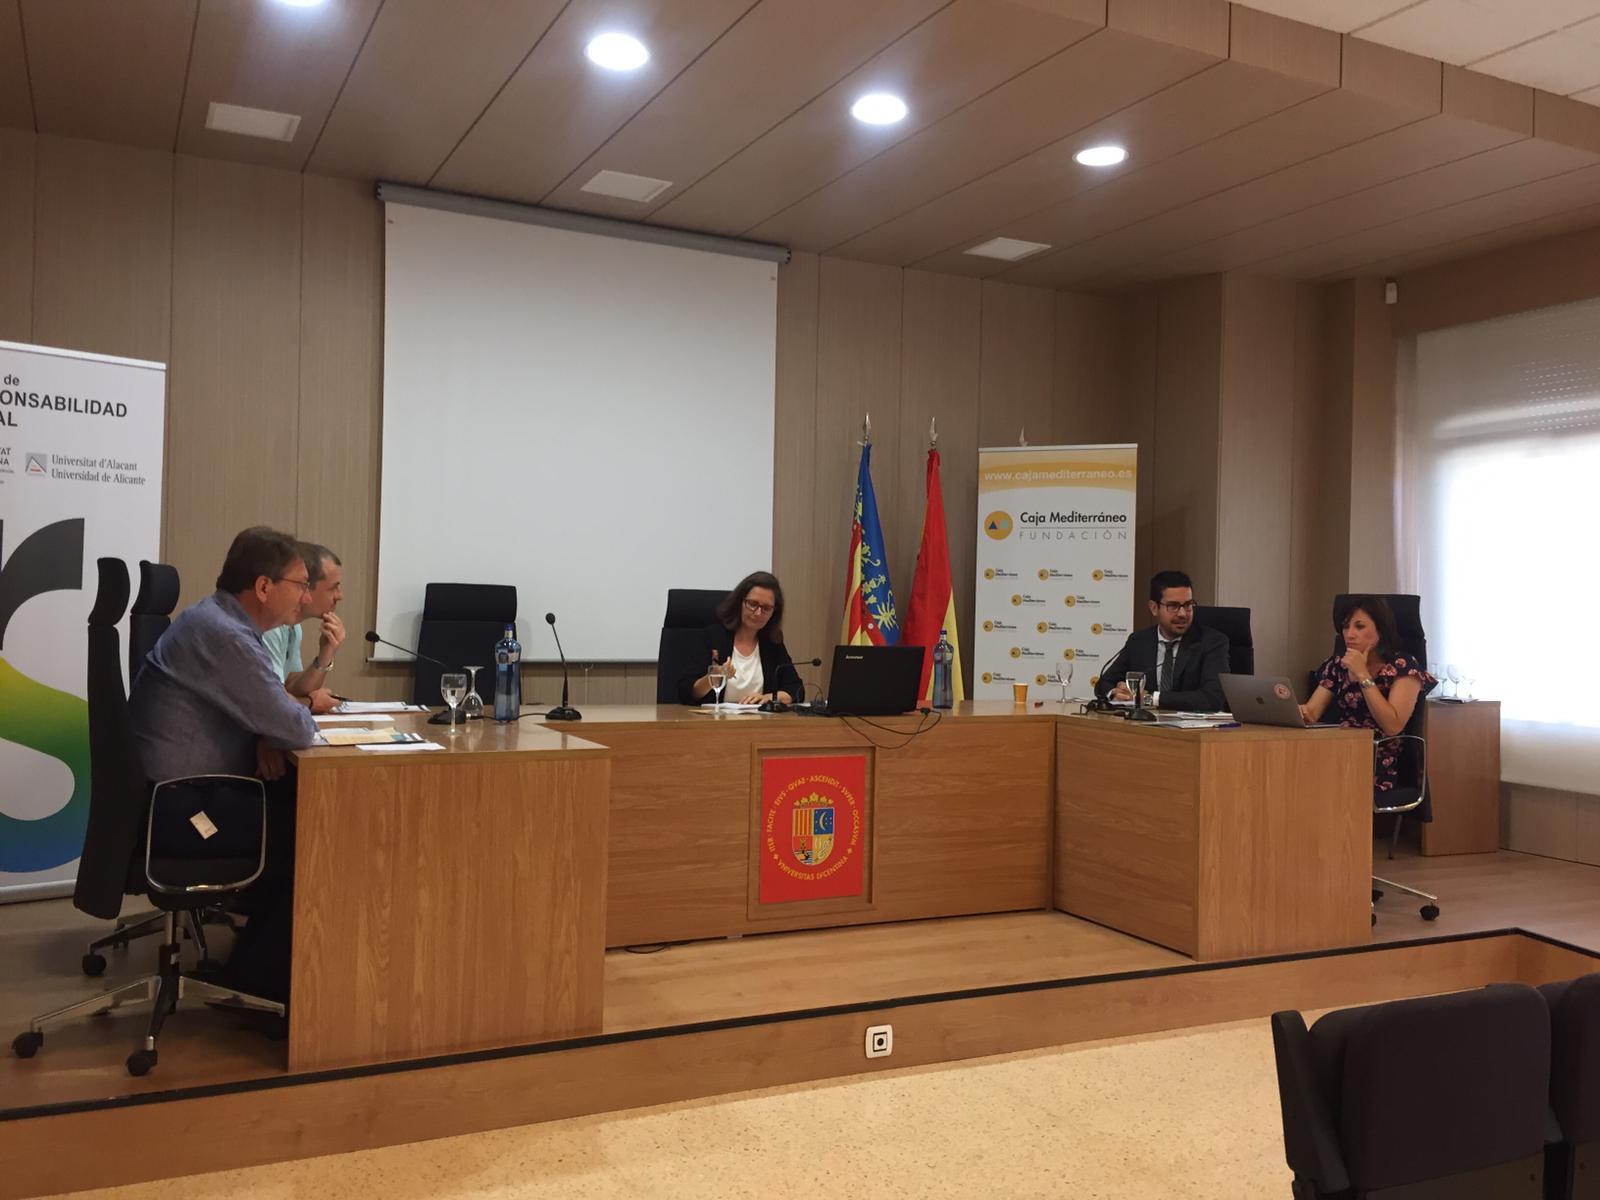 II Conferencia Estratégica sobre Responsabilidad Social